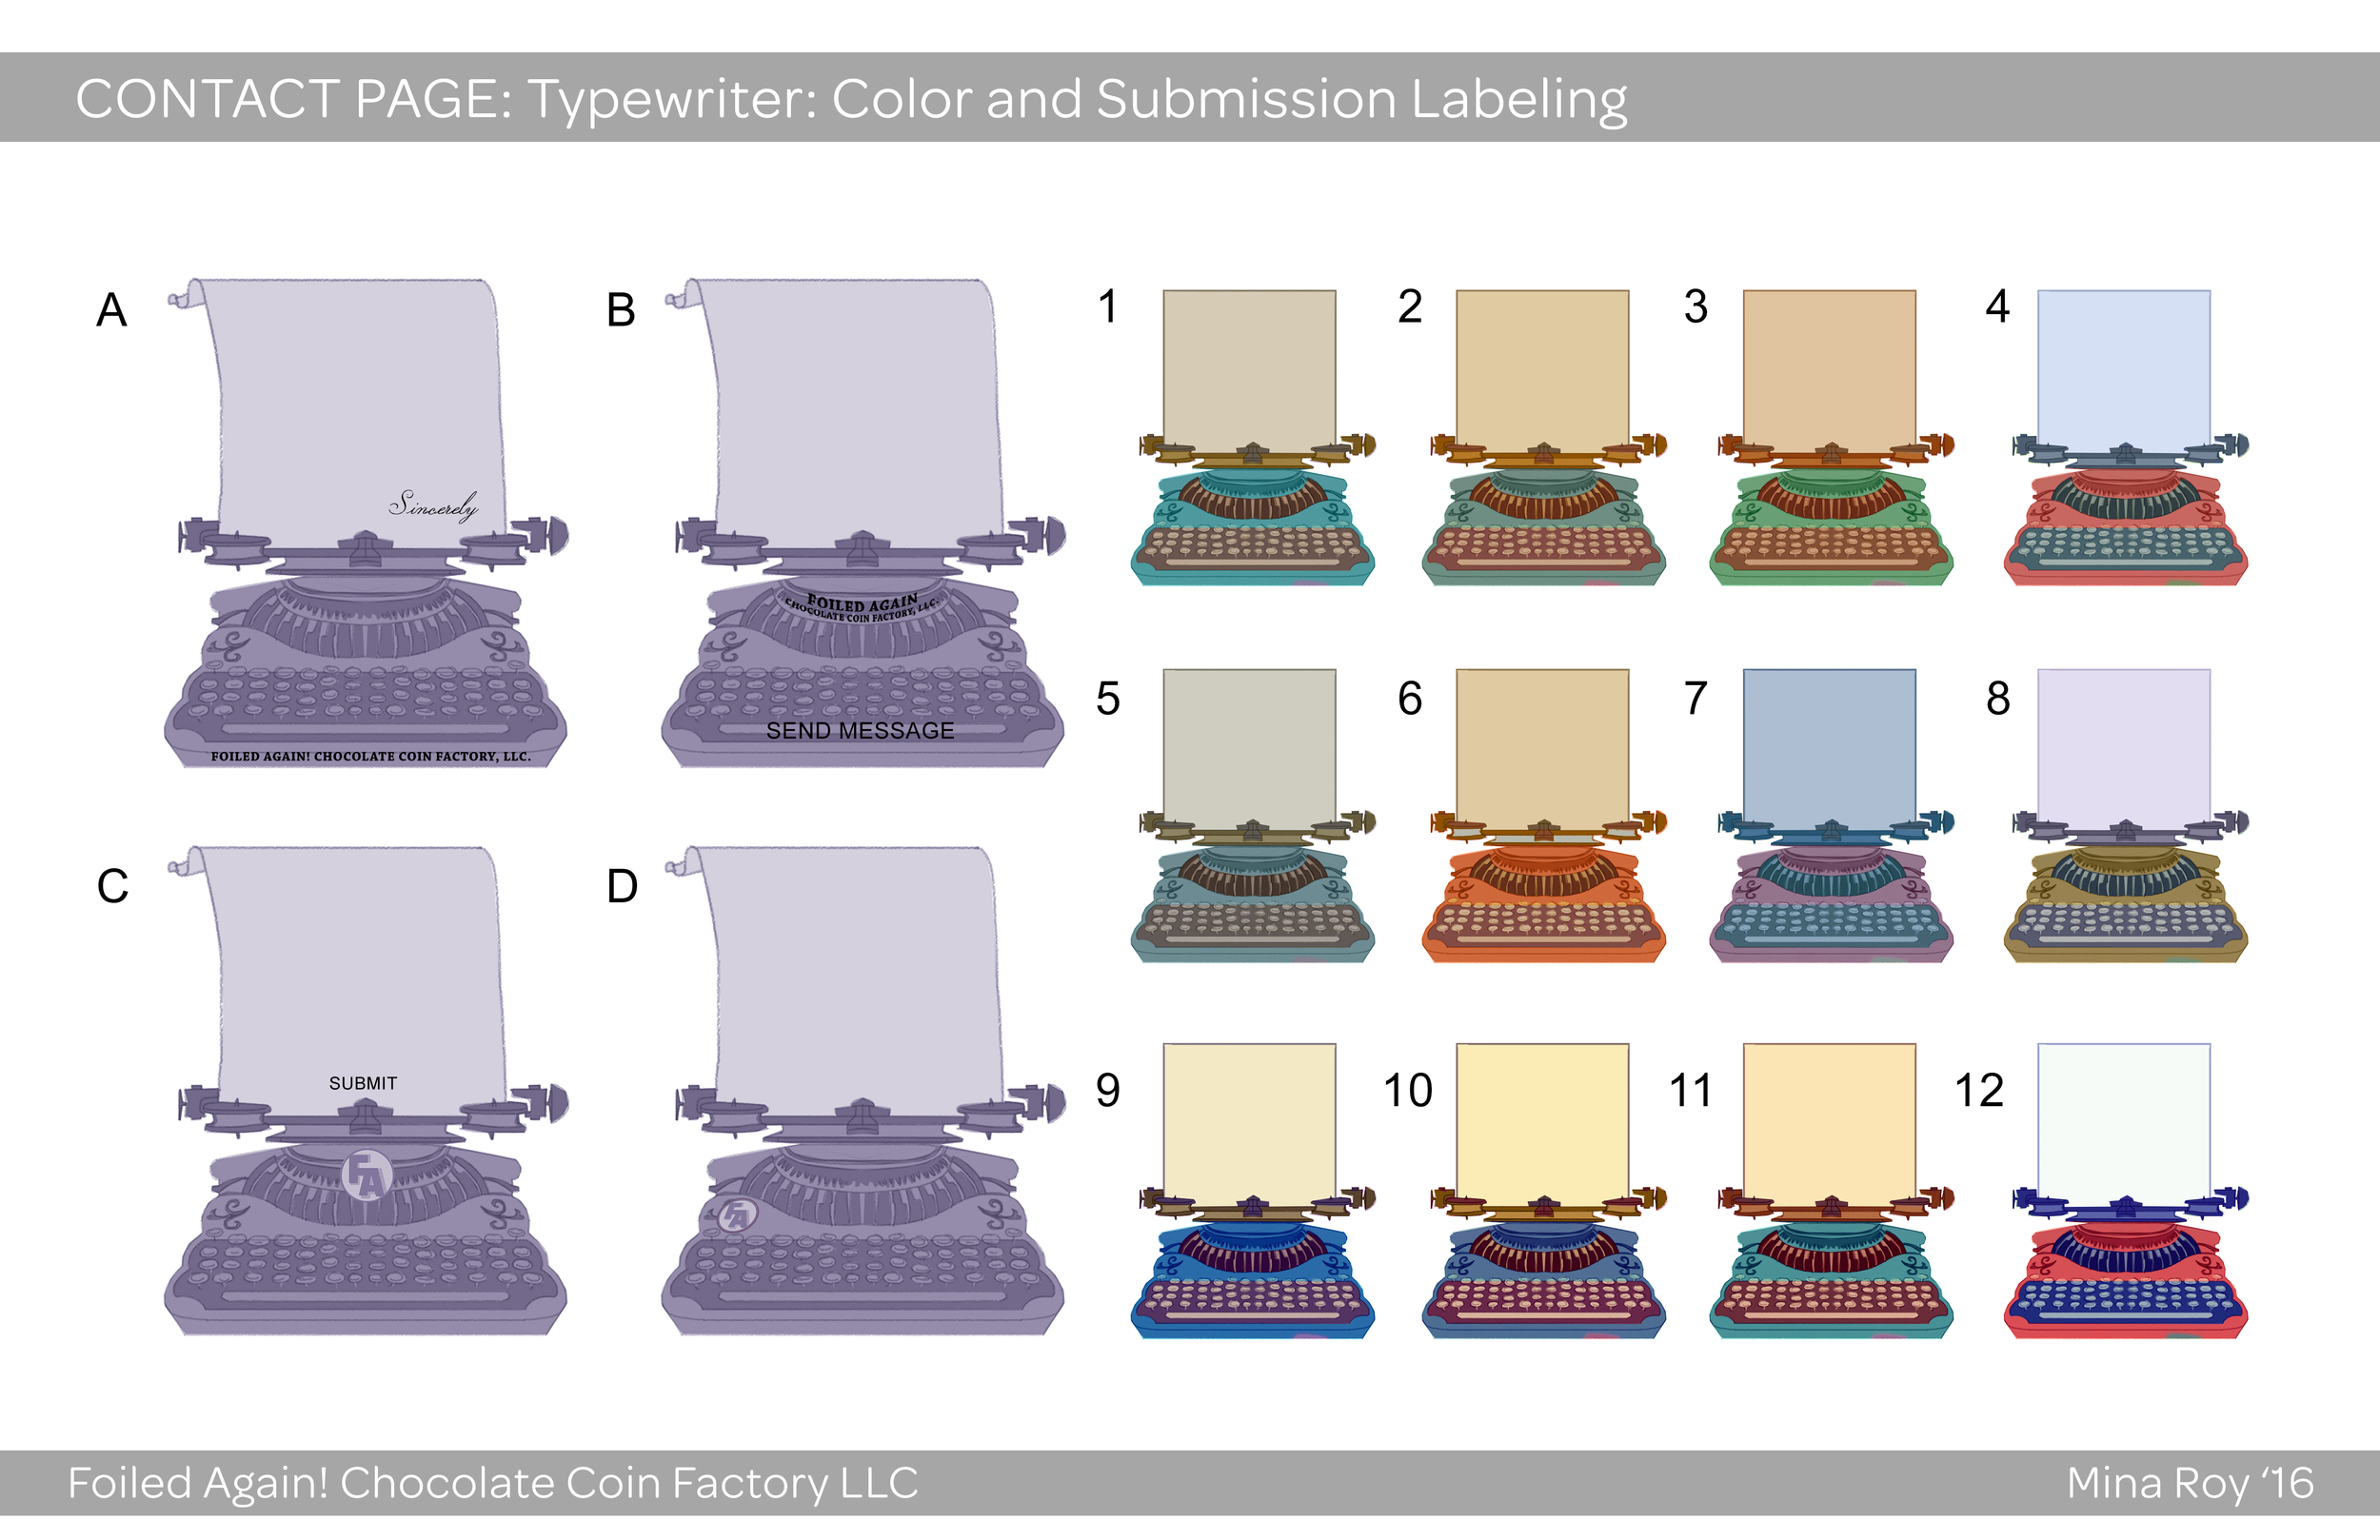 website-colorandsubmissionlabeling-typewriter.jpg